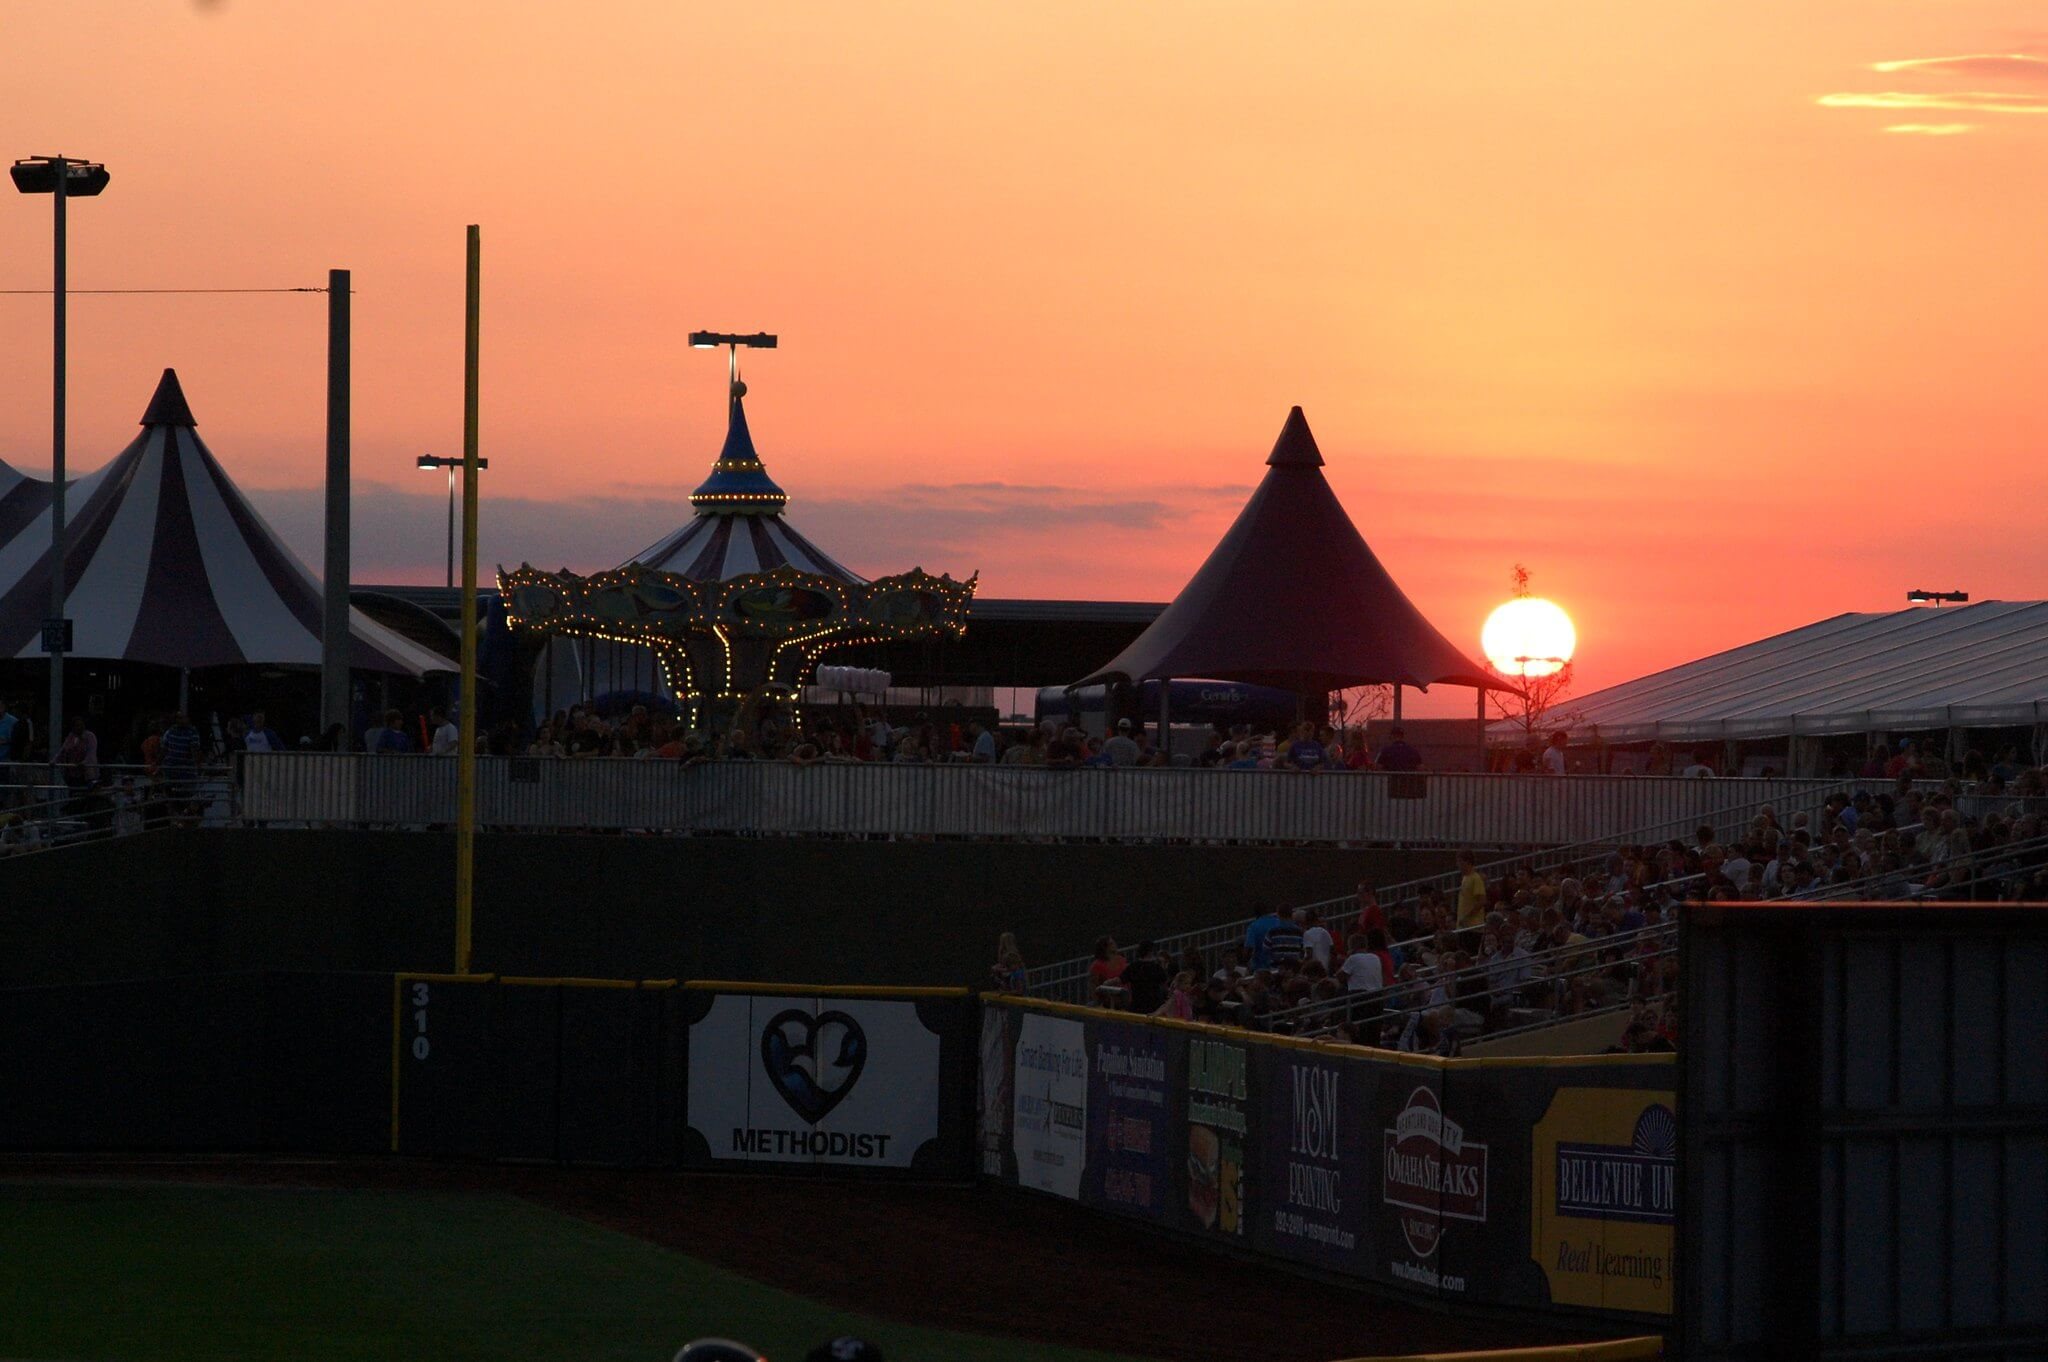 Werner Park ballpark